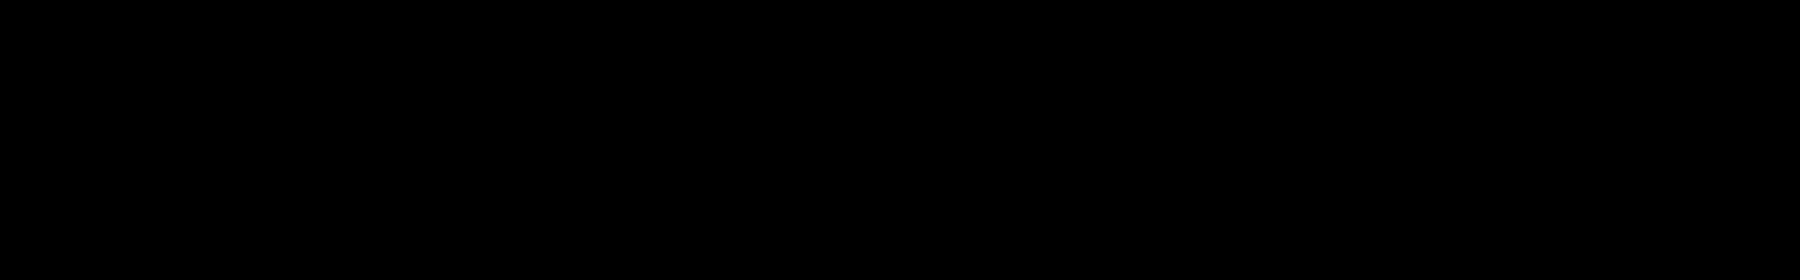 Razor Microscope audio waveform